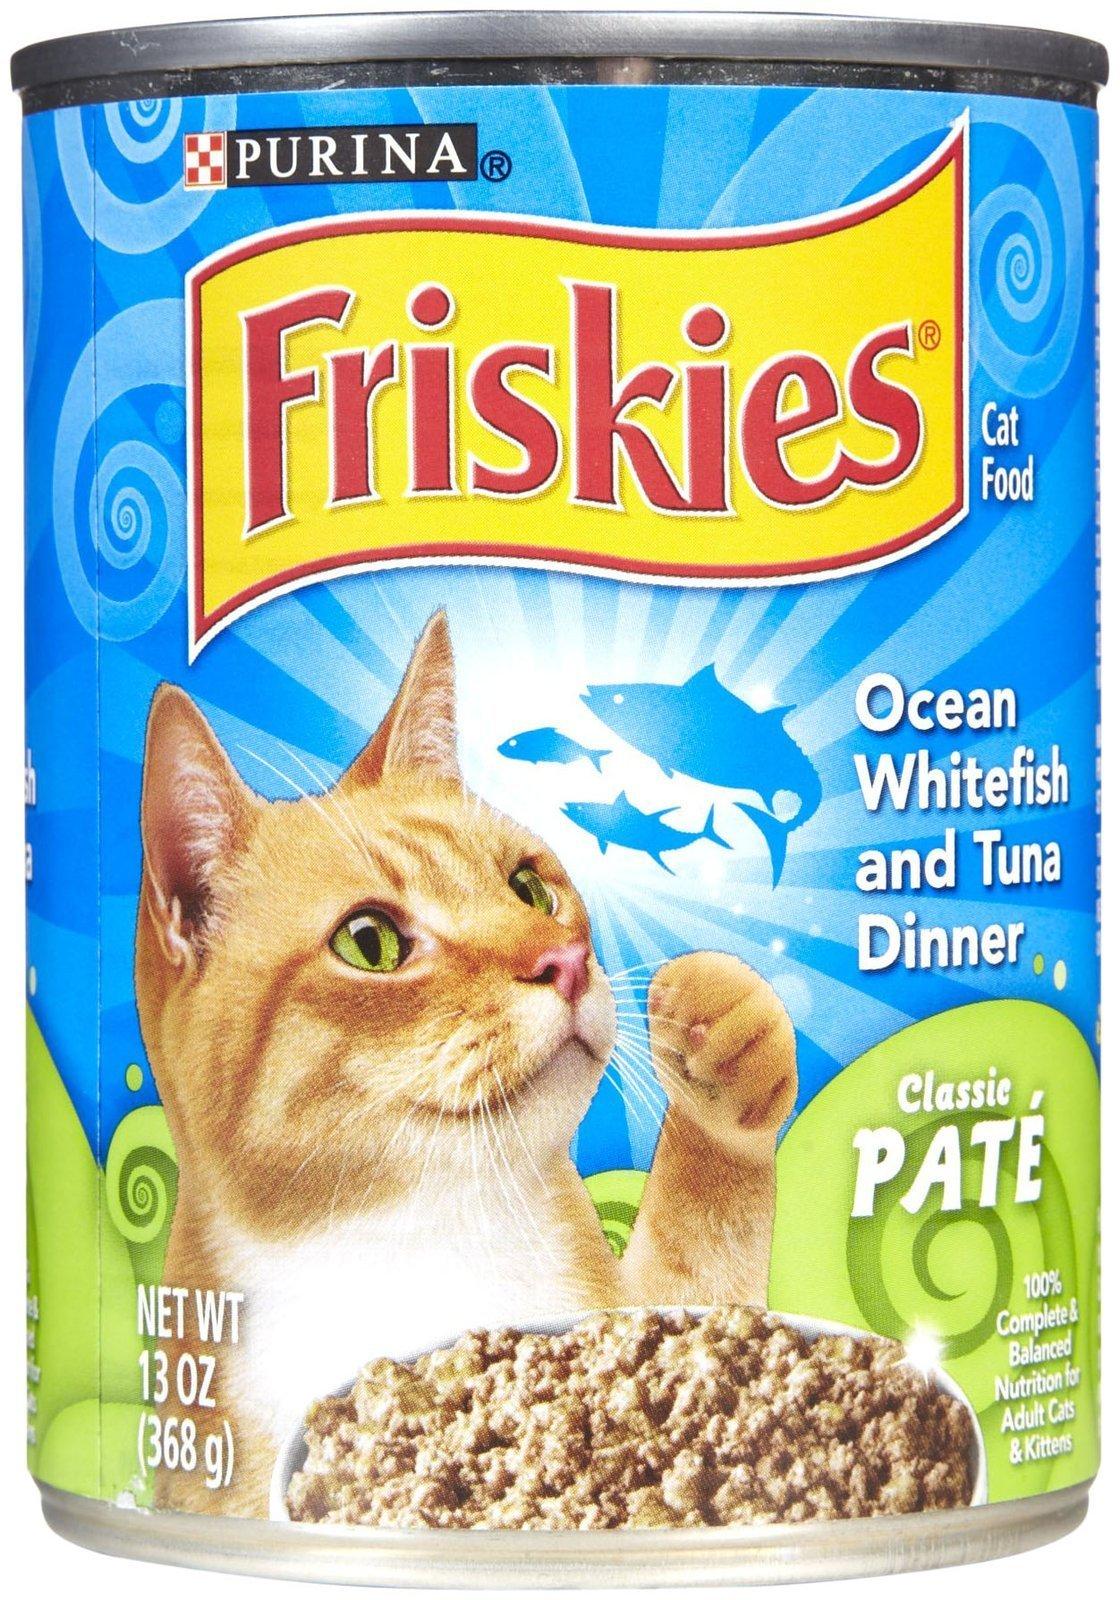 Friskies Classic Pate - Ocean Whitefish & Tuna Dinner - 12x13 oz